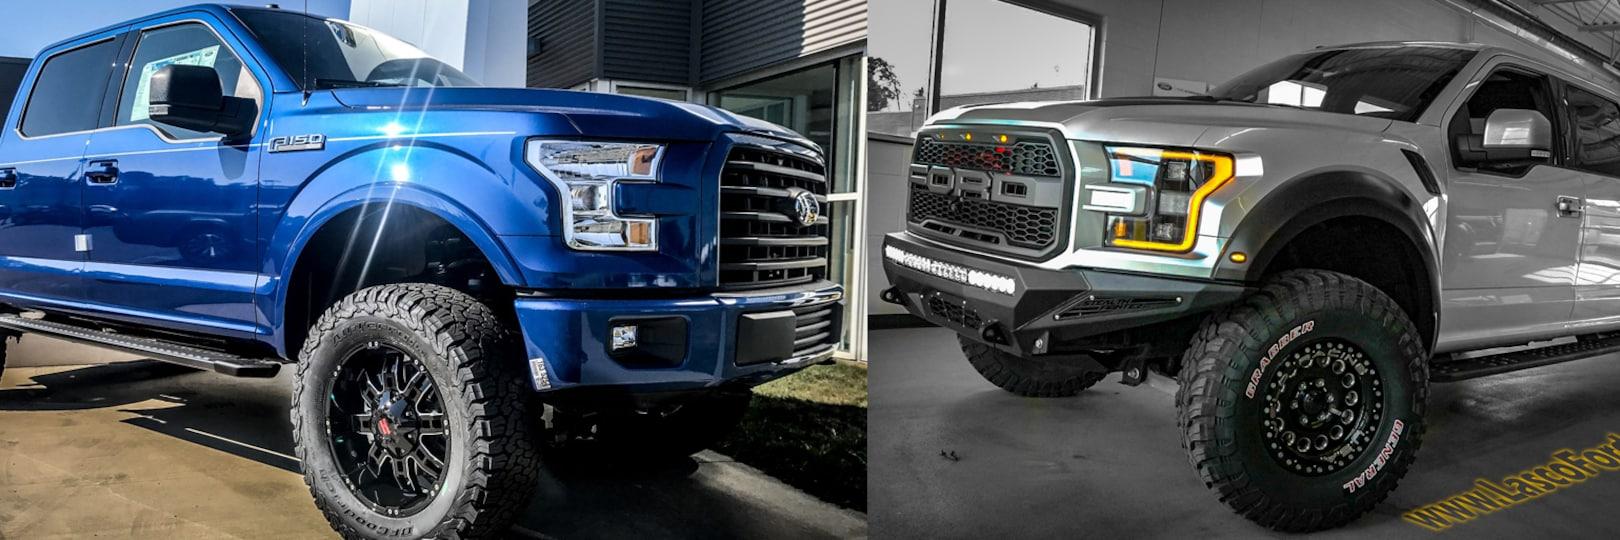 new ford used car dealer in fenton mi lasco ford. Black Bedroom Furniture Sets. Home Design Ideas